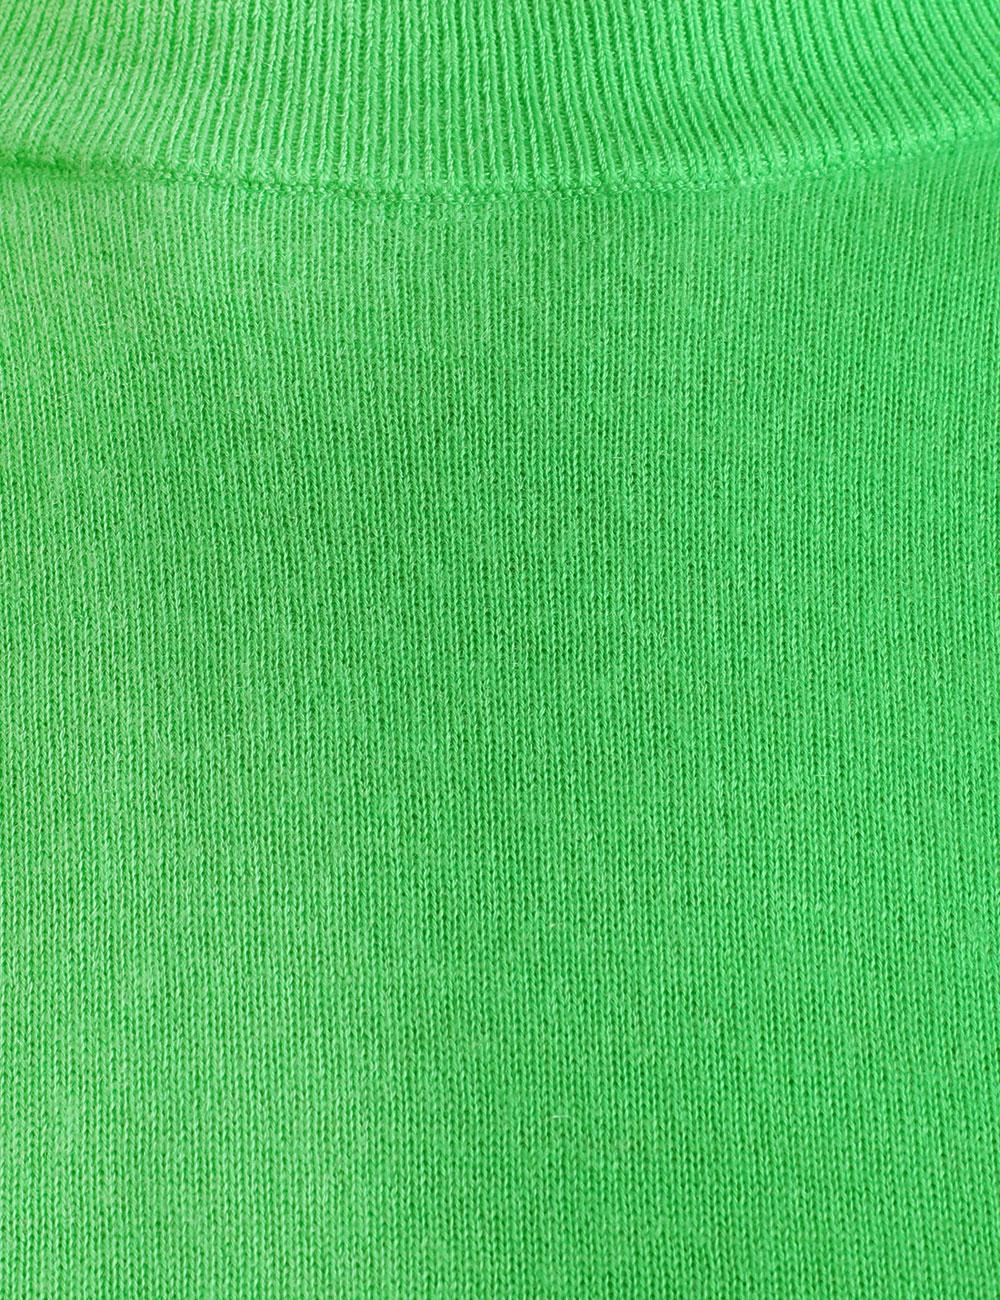 The Lovestruck Knit Top